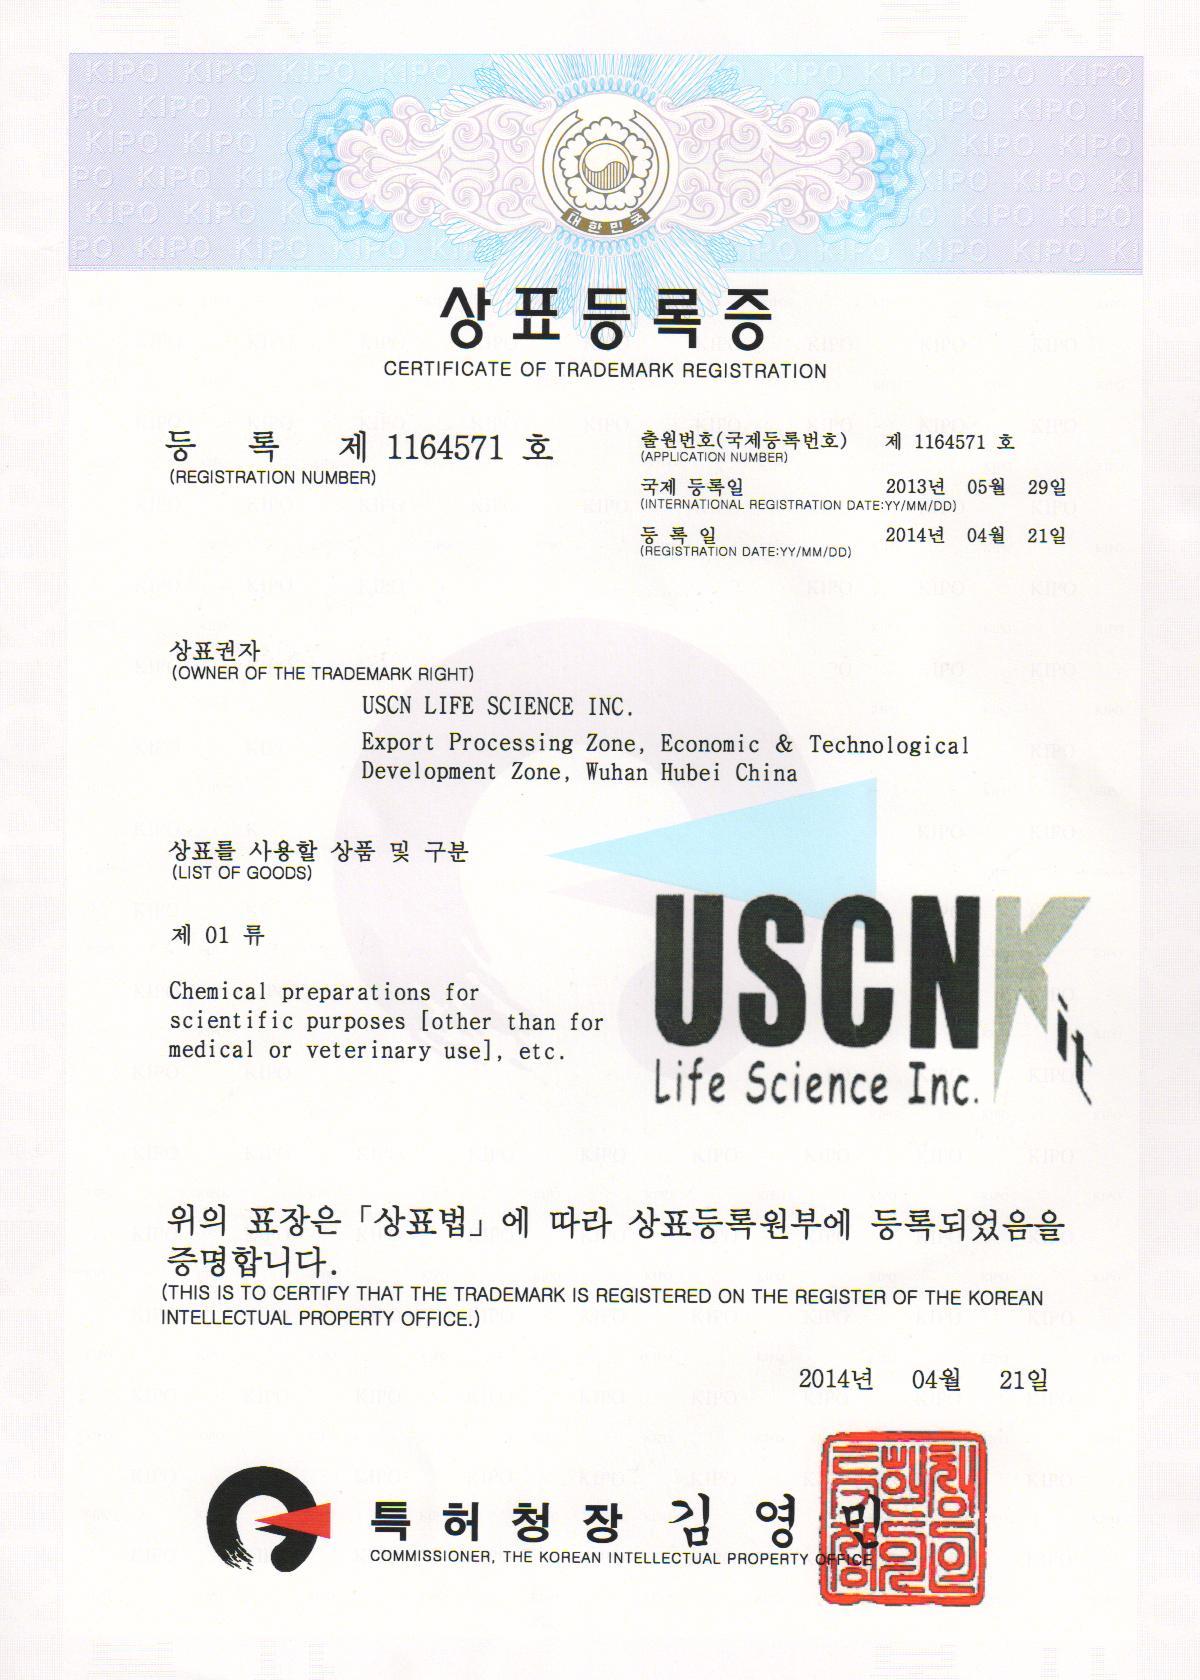 USCNK韩国《商标注册证》